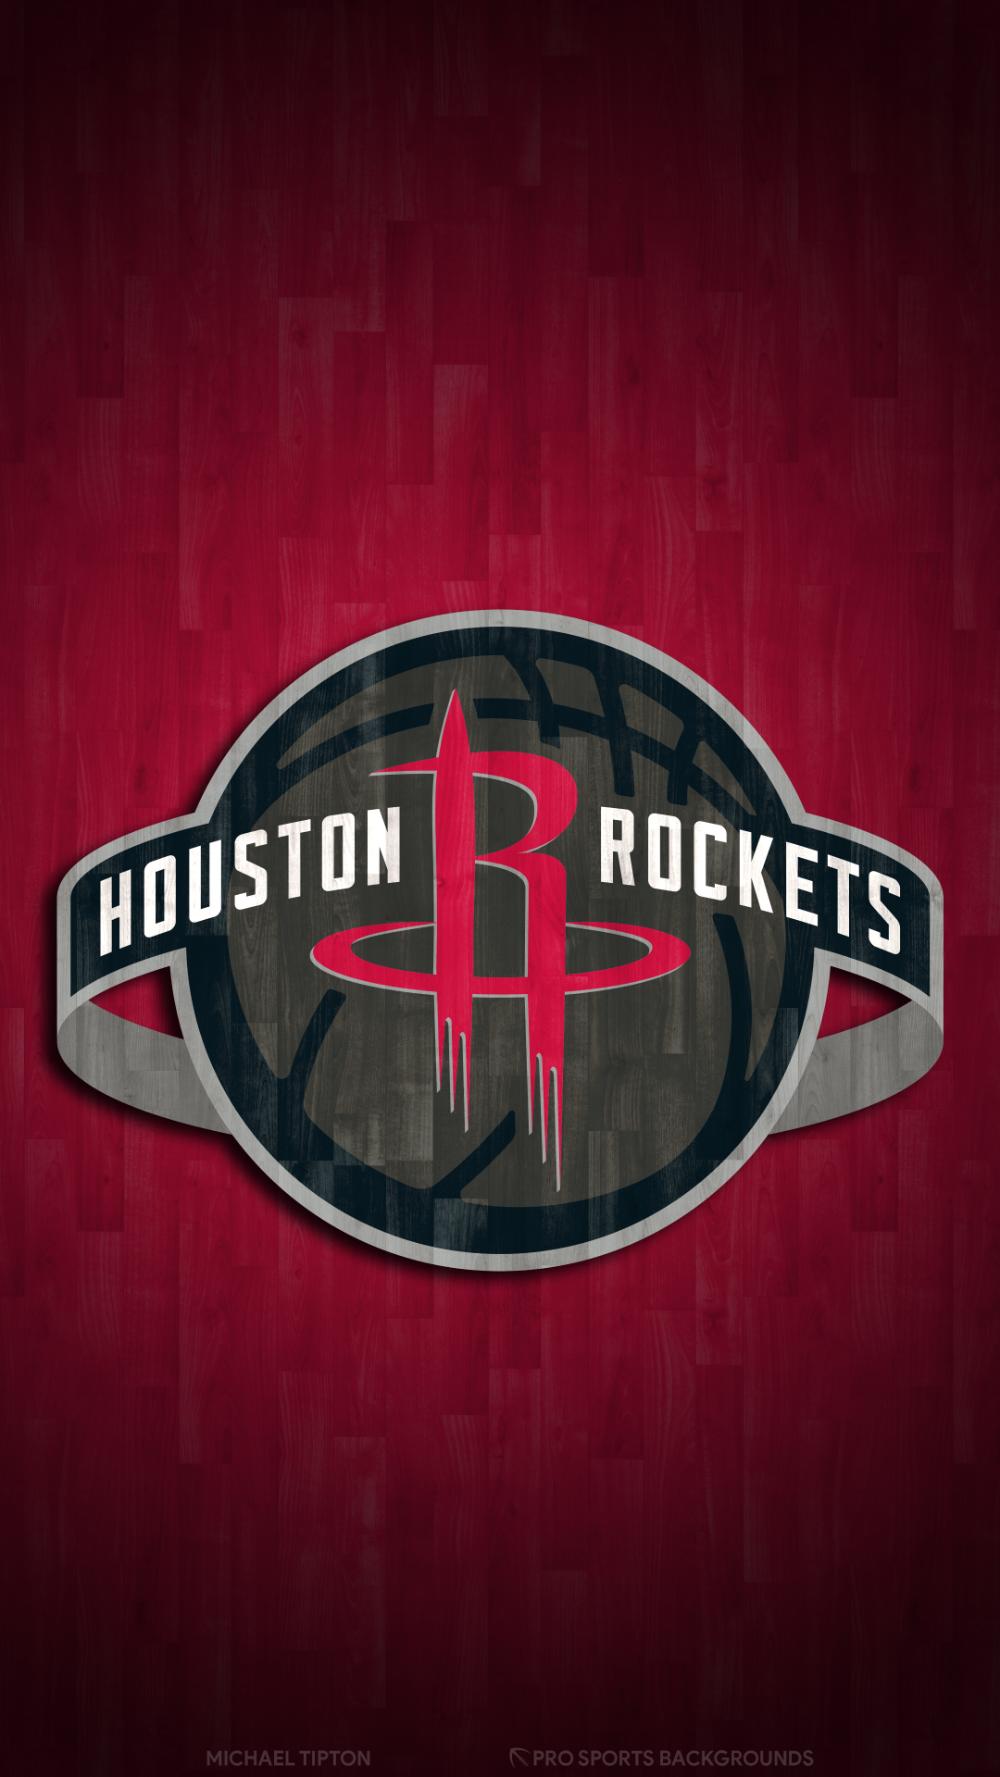 Houston Rockets Wallpapers Pro Sports Backgrounds Nba Houston Rockets Houston Rockets Houston Rockets Basketball